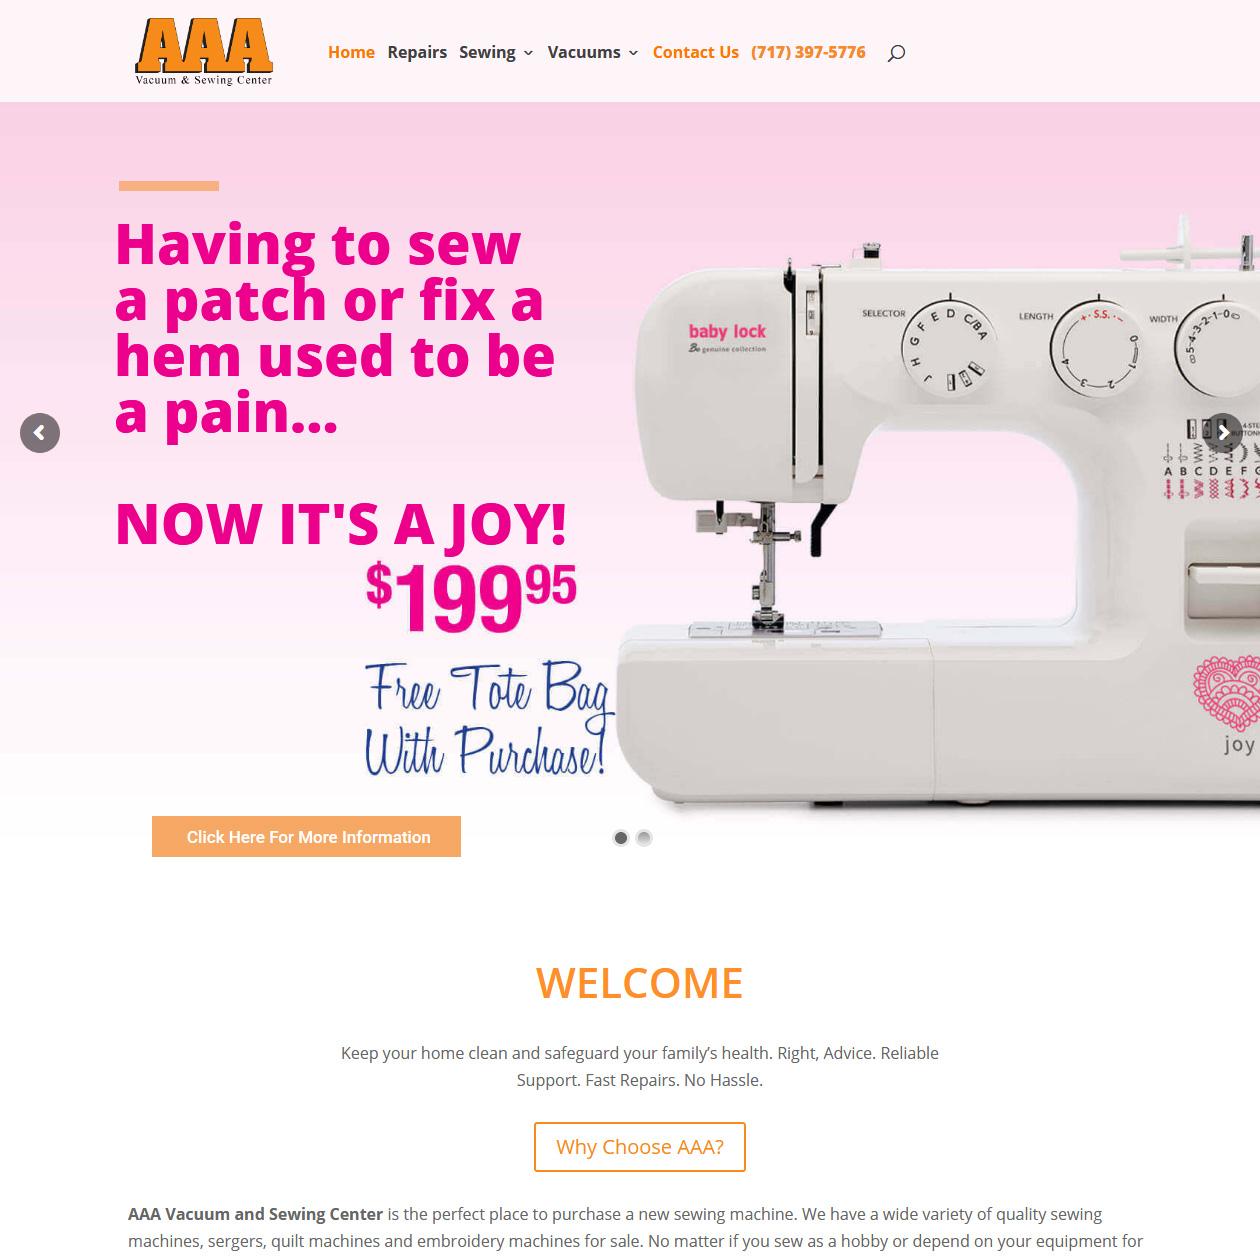 AAA Vacuum & Sewing Center website design